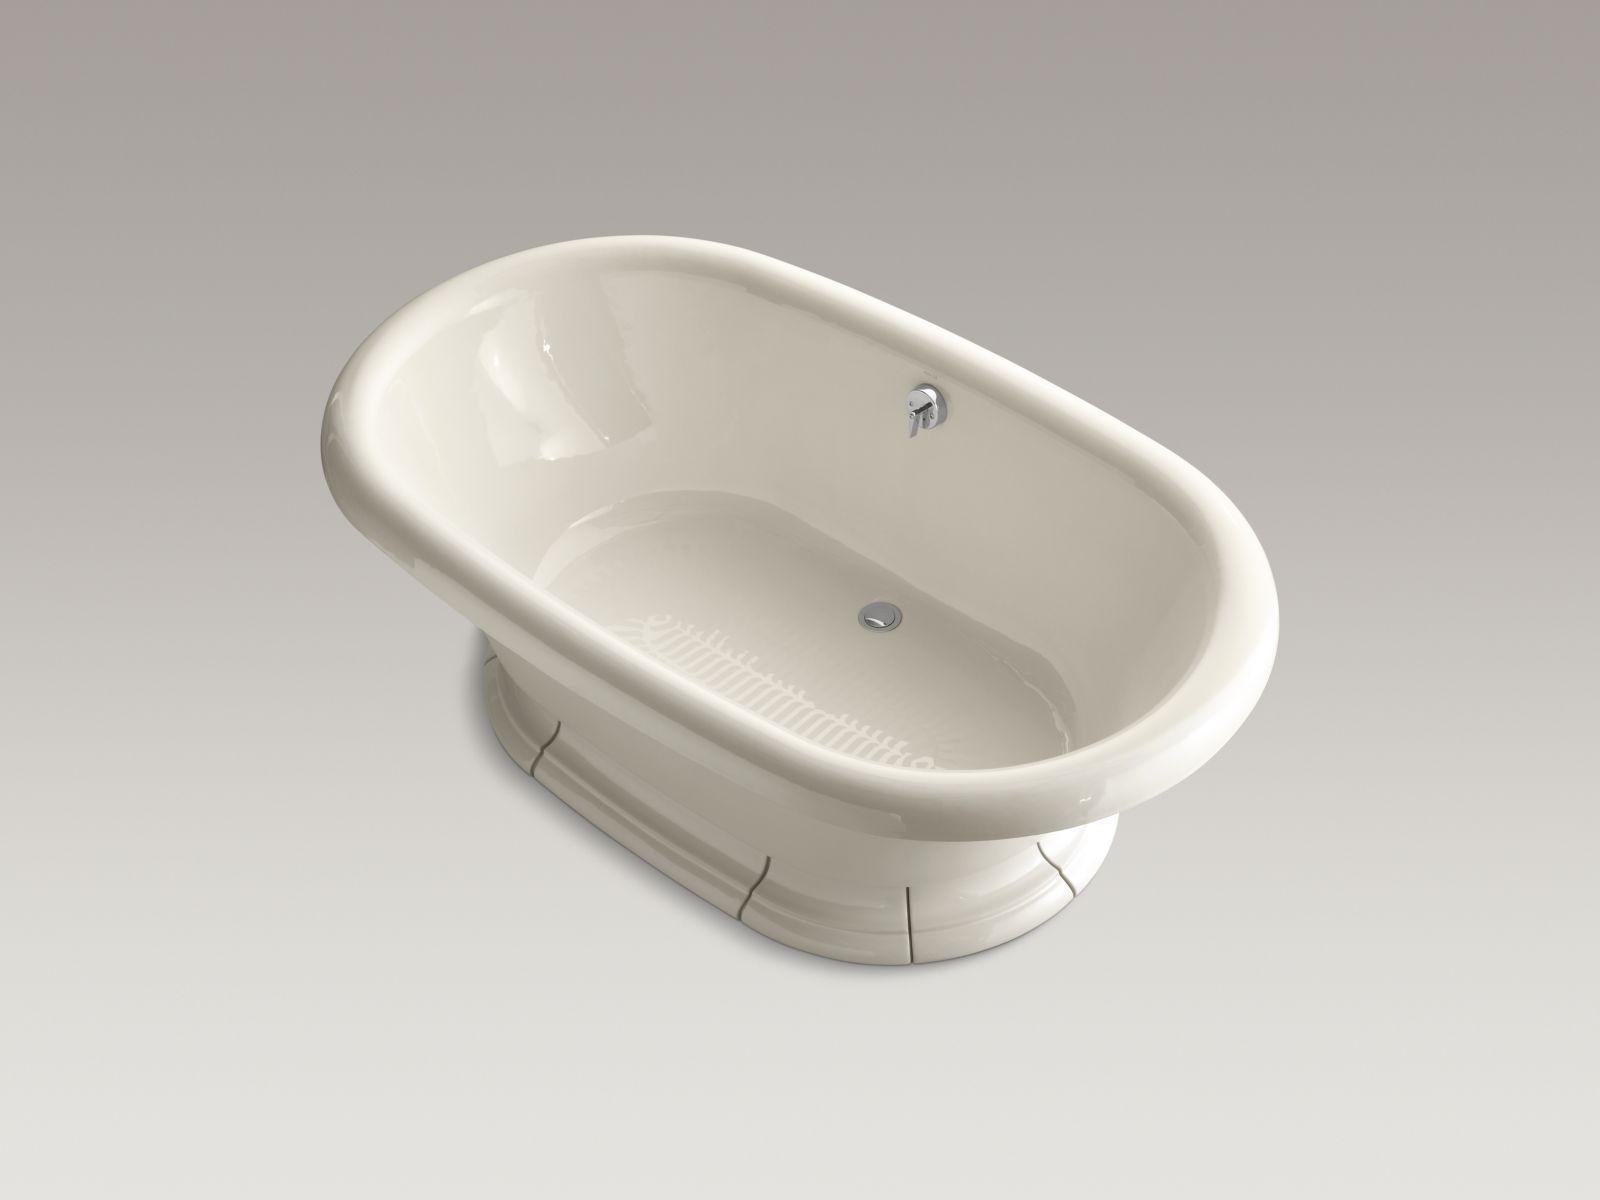 Kohler K-700-47 Vintage Bath Almond